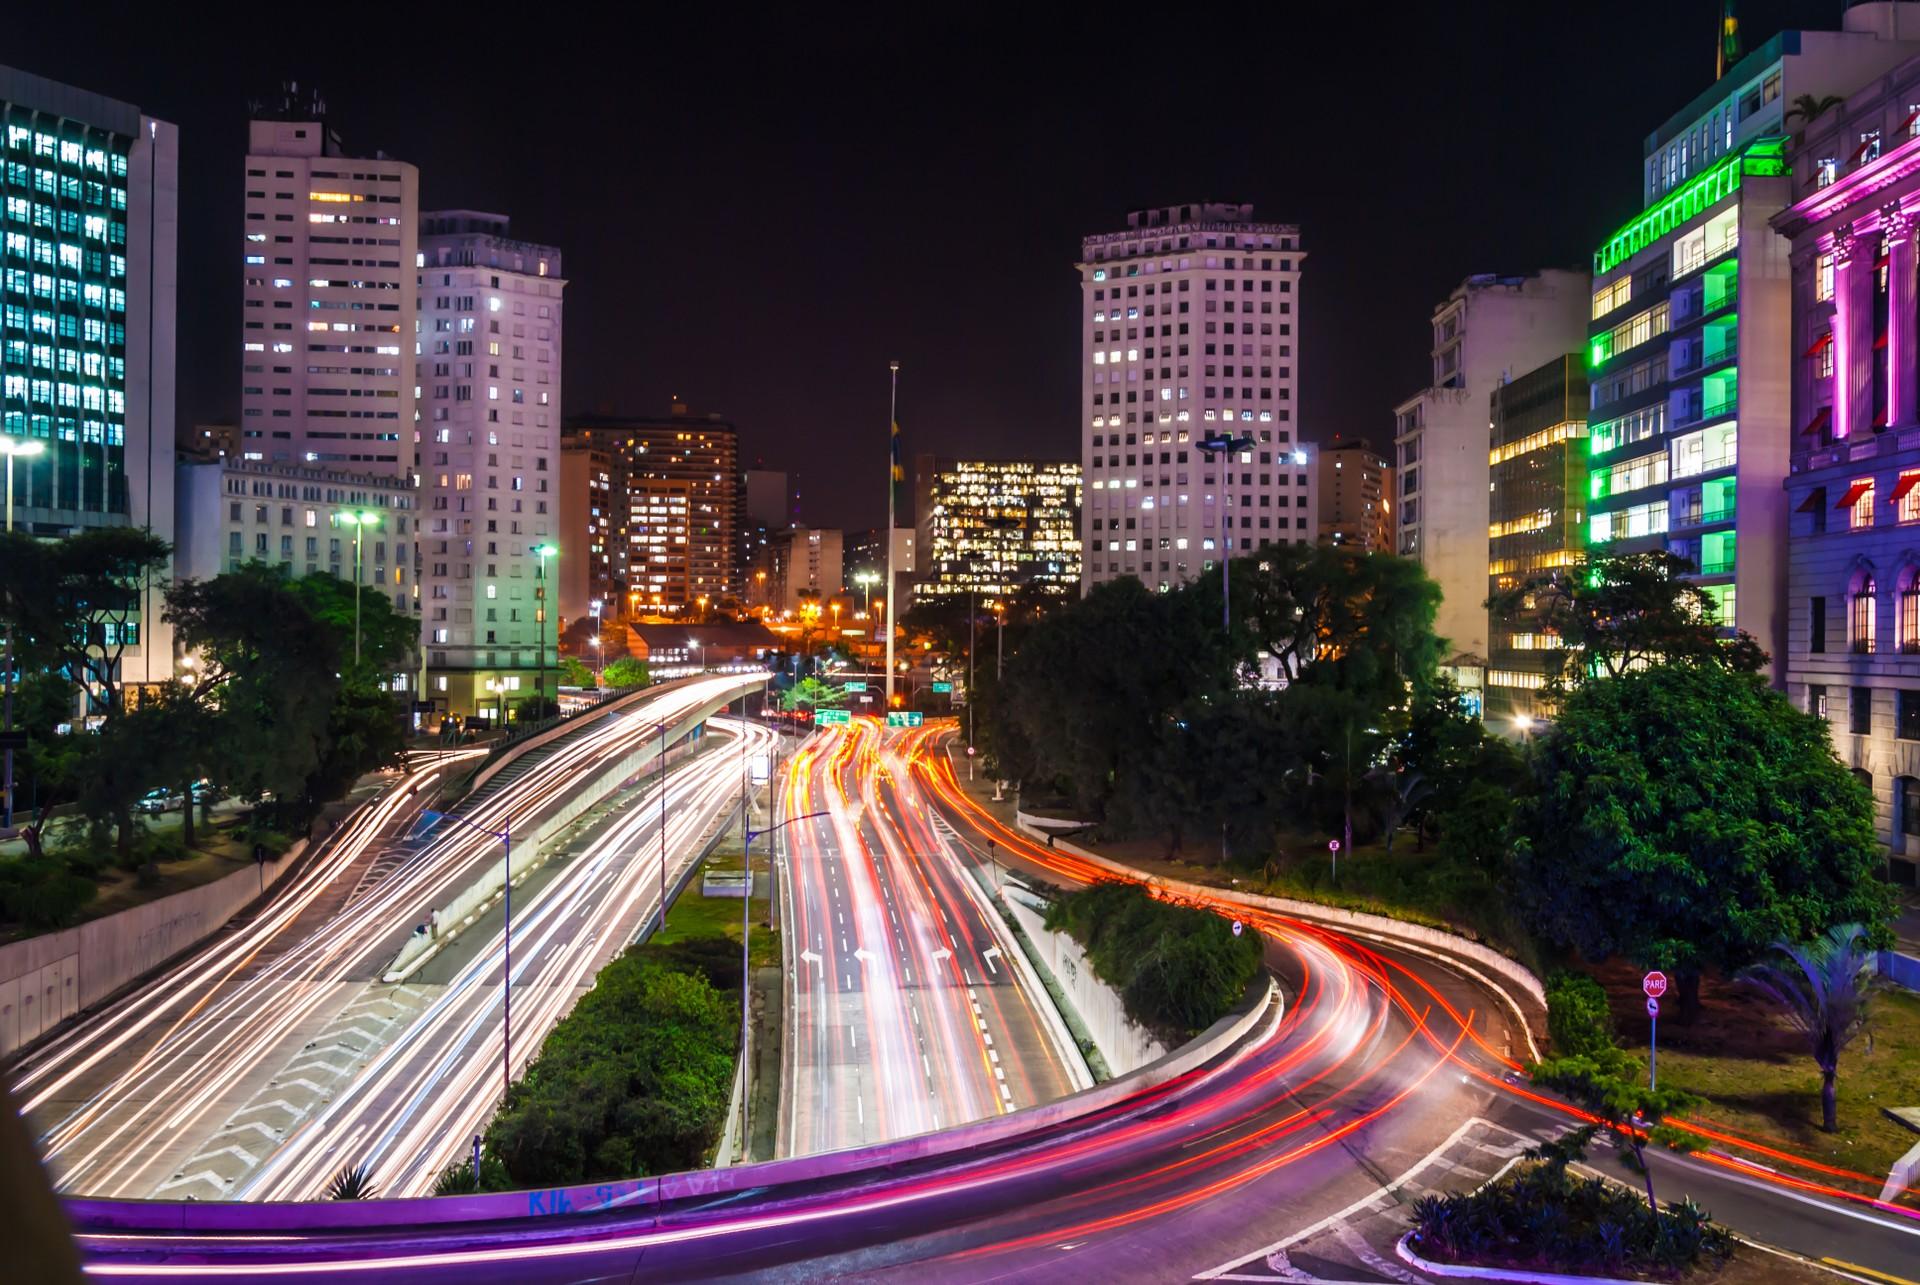 The bright lights of São Paulo at night